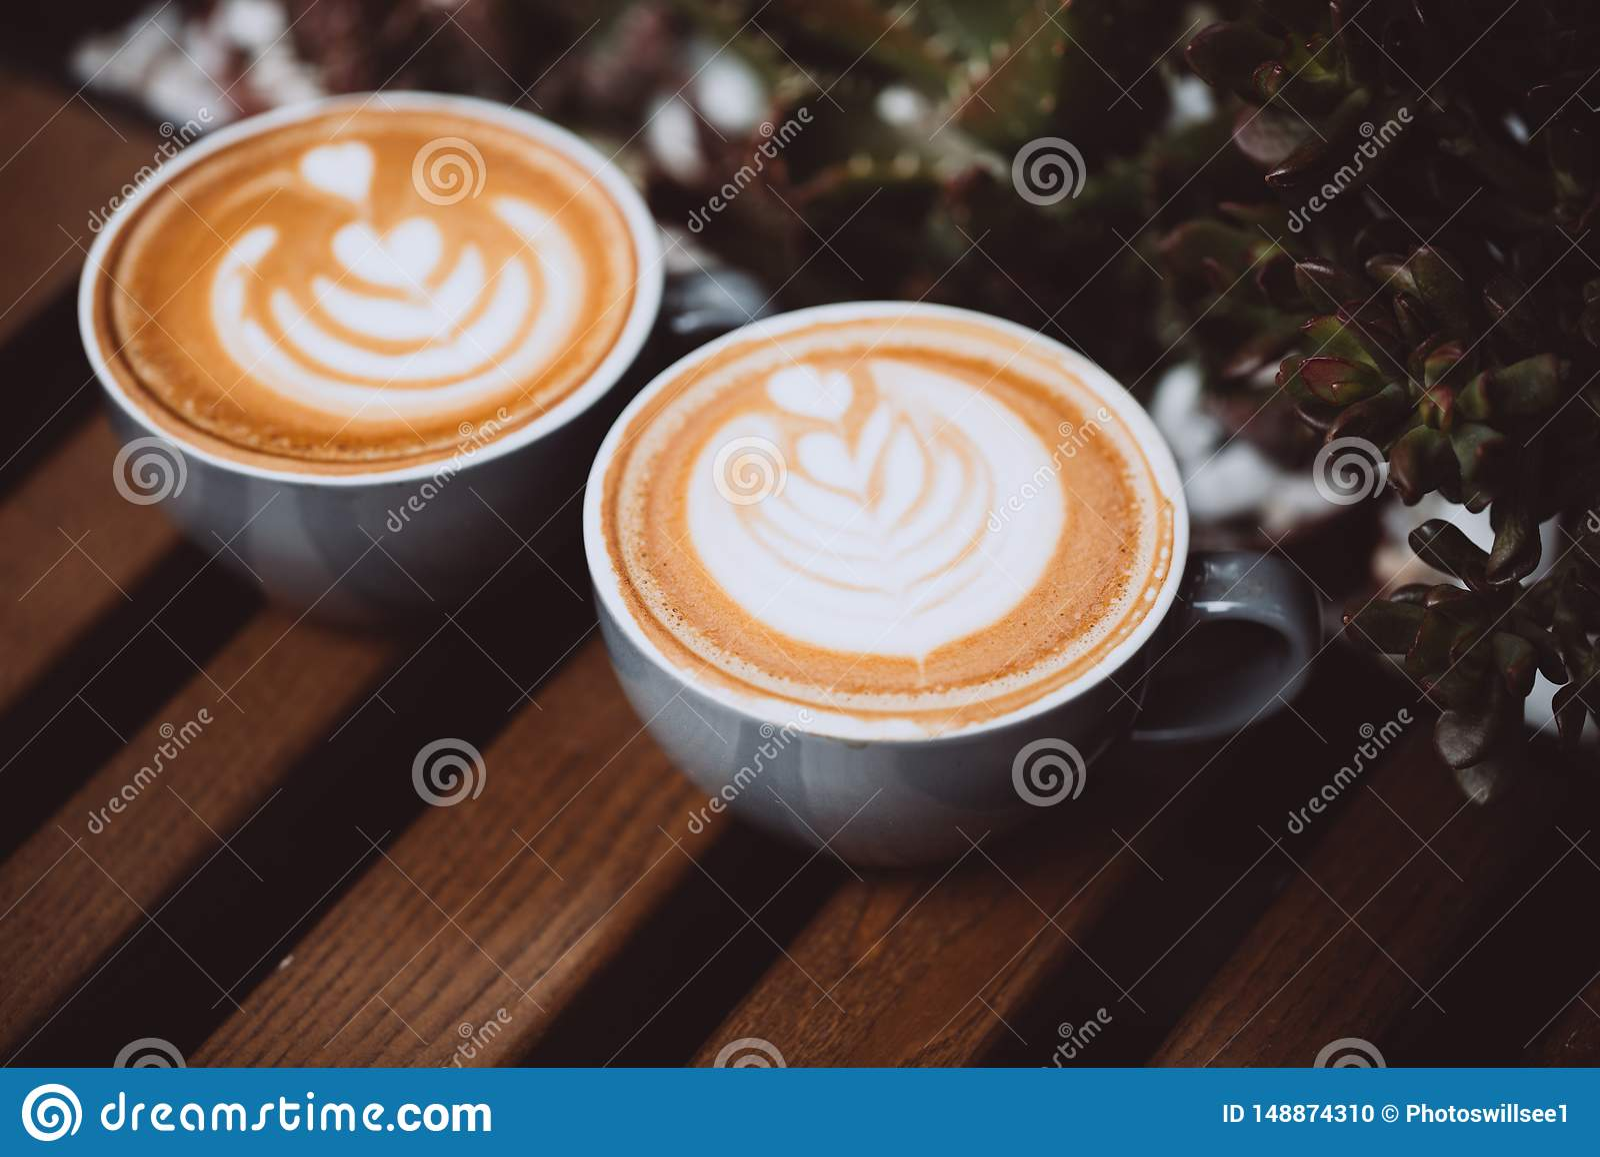 Cappuccino cups tv?